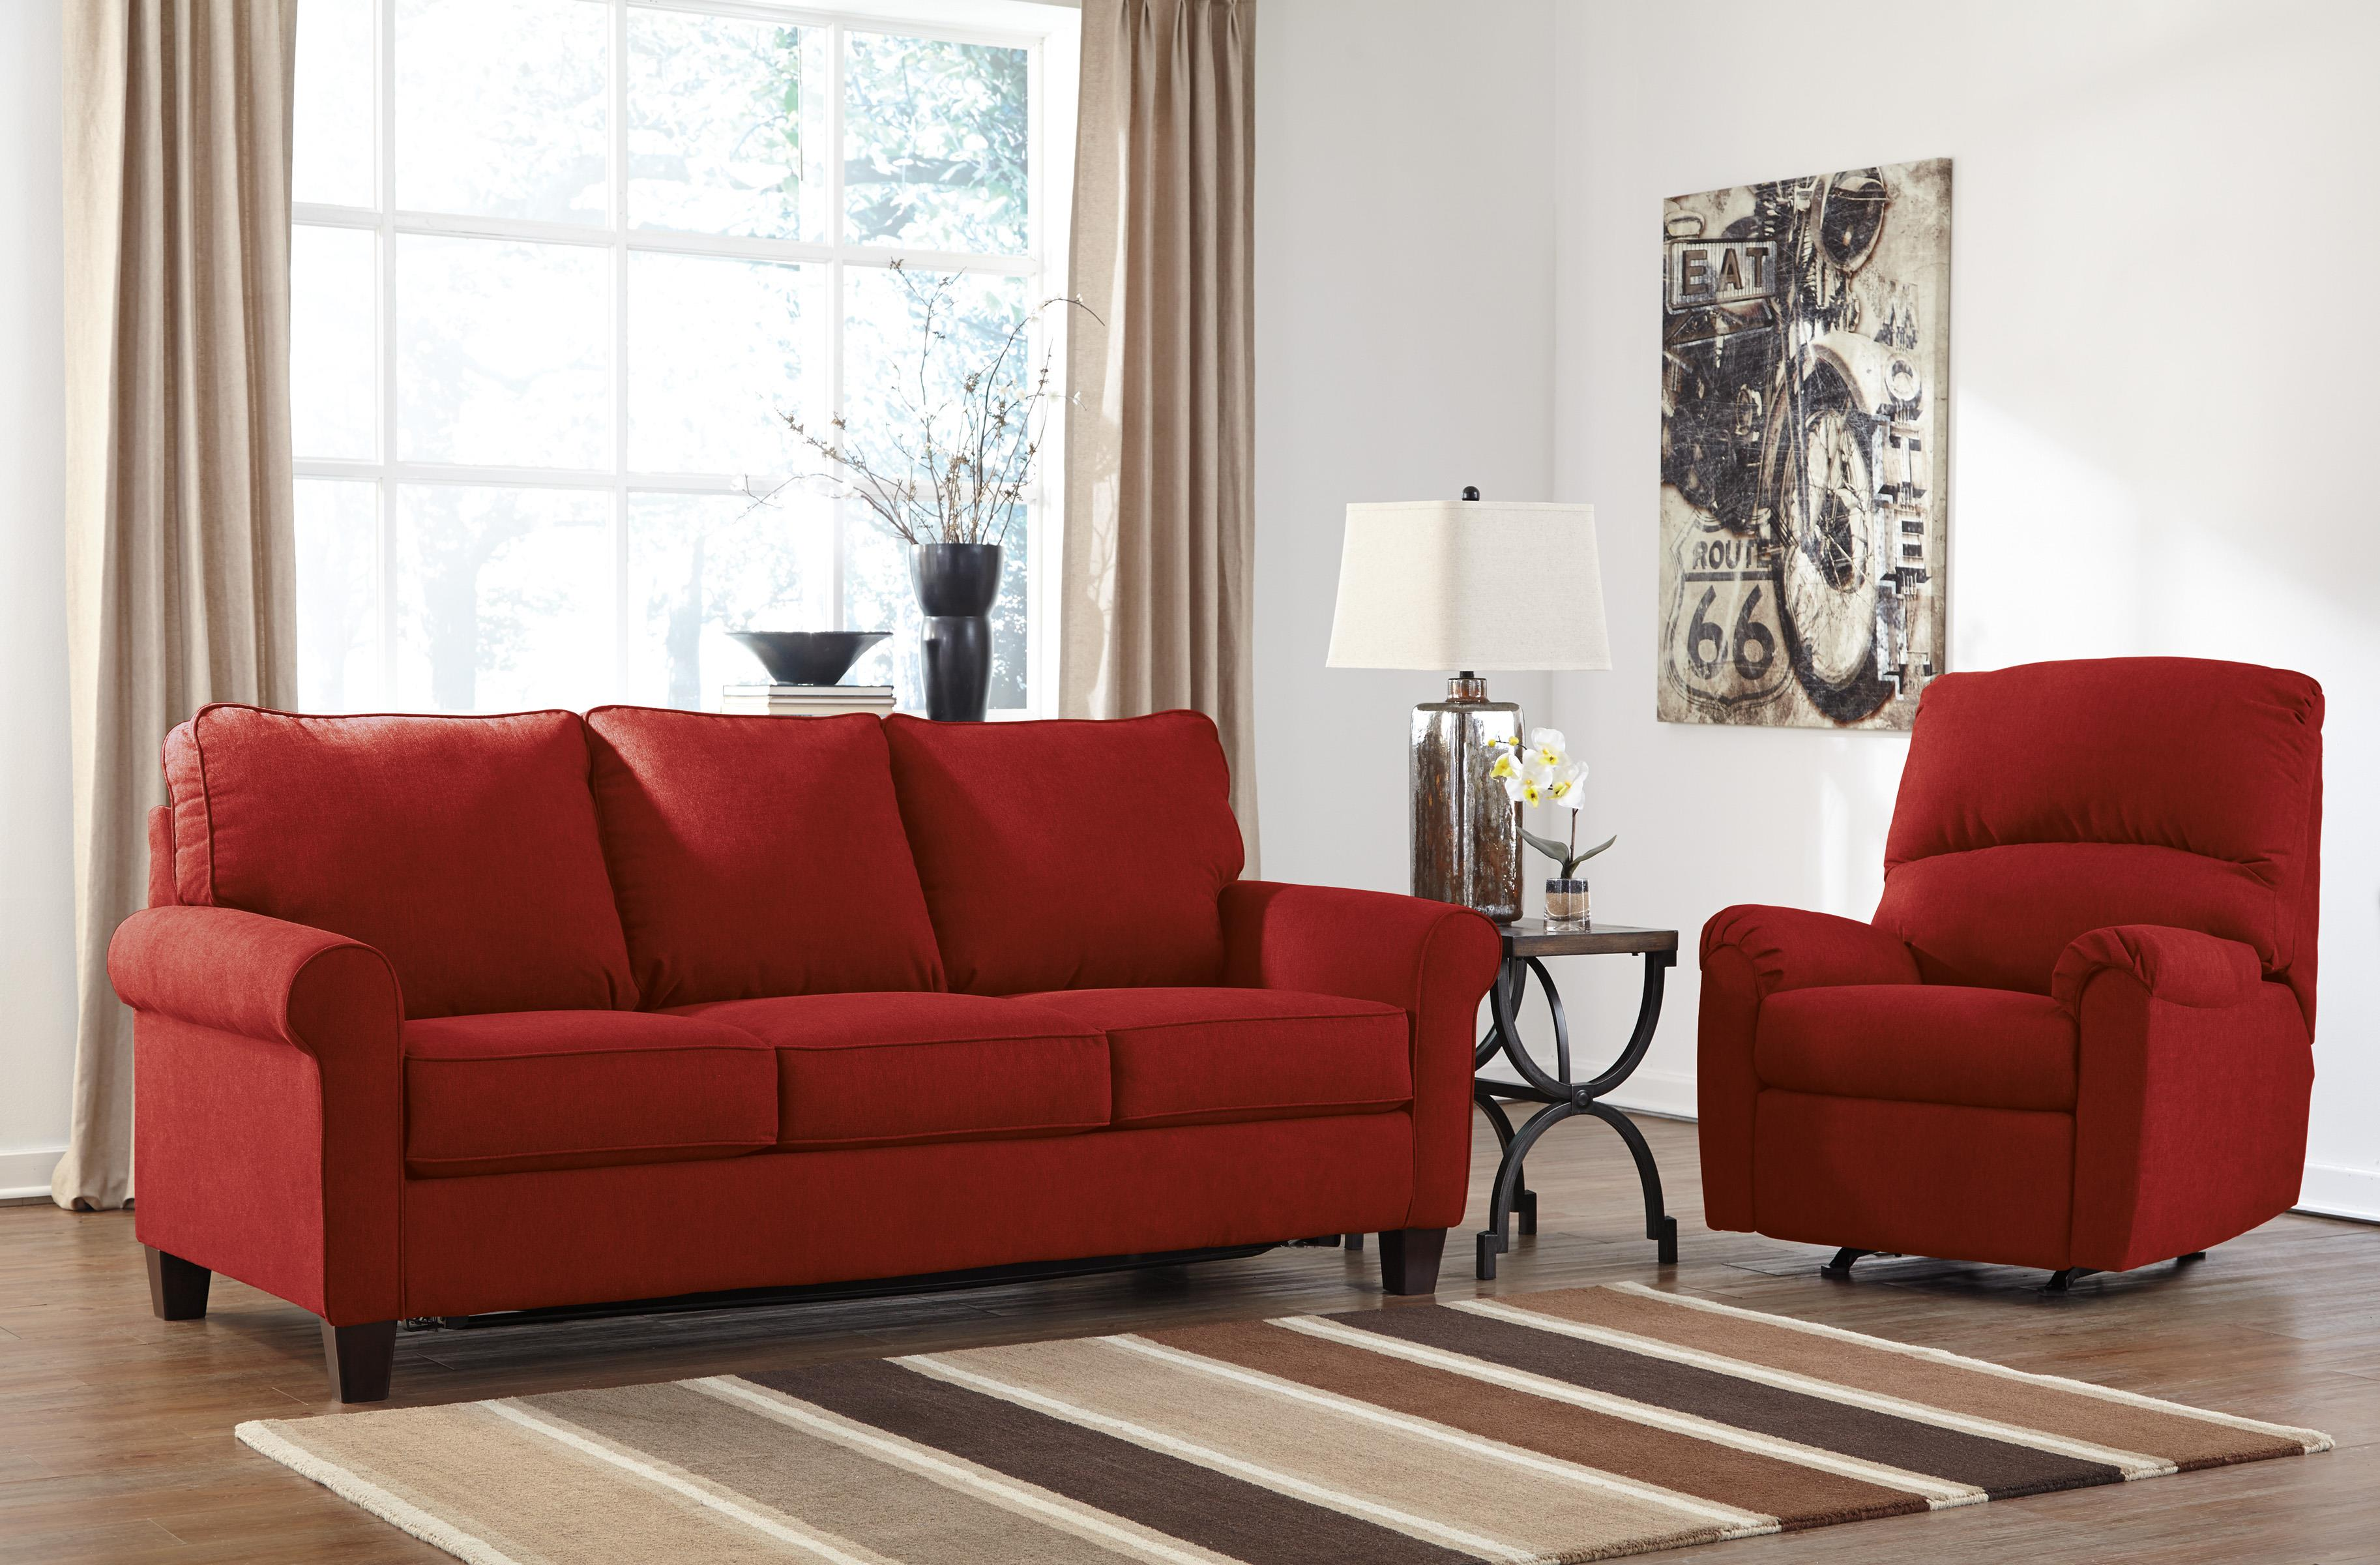 Signature Design by Ashley Zeth - Crimson Stationary Living Room Group - Item Number: 27102 Living Room Group 3